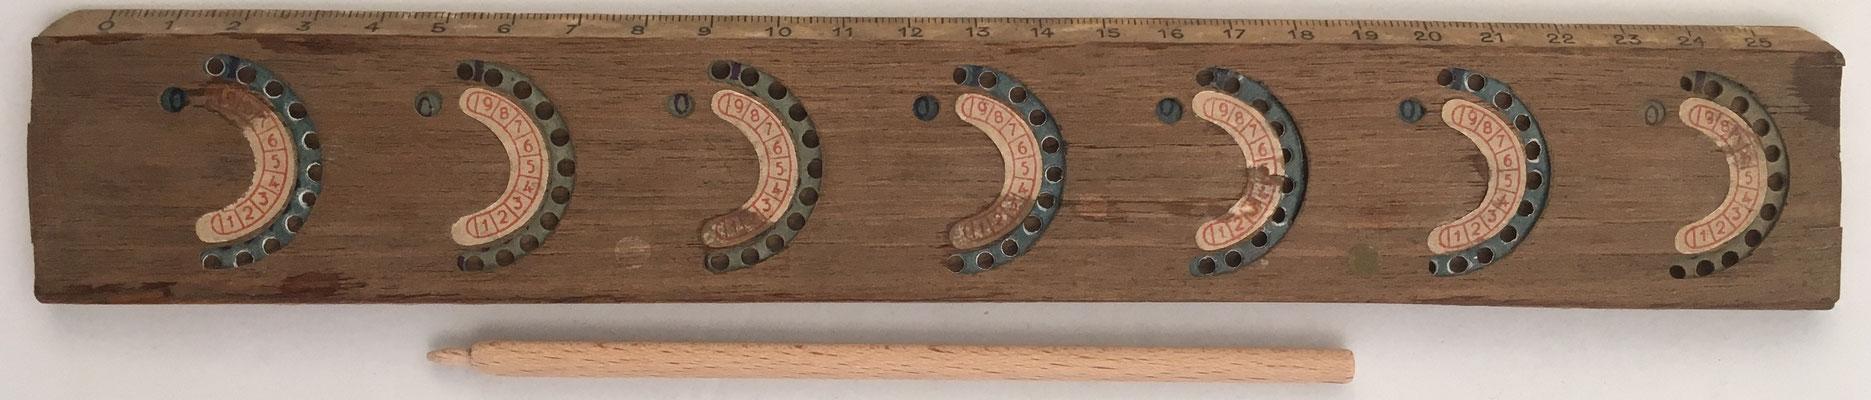 Regla Sumadora (ábaco de círculos) hecha en España, 27x4cm